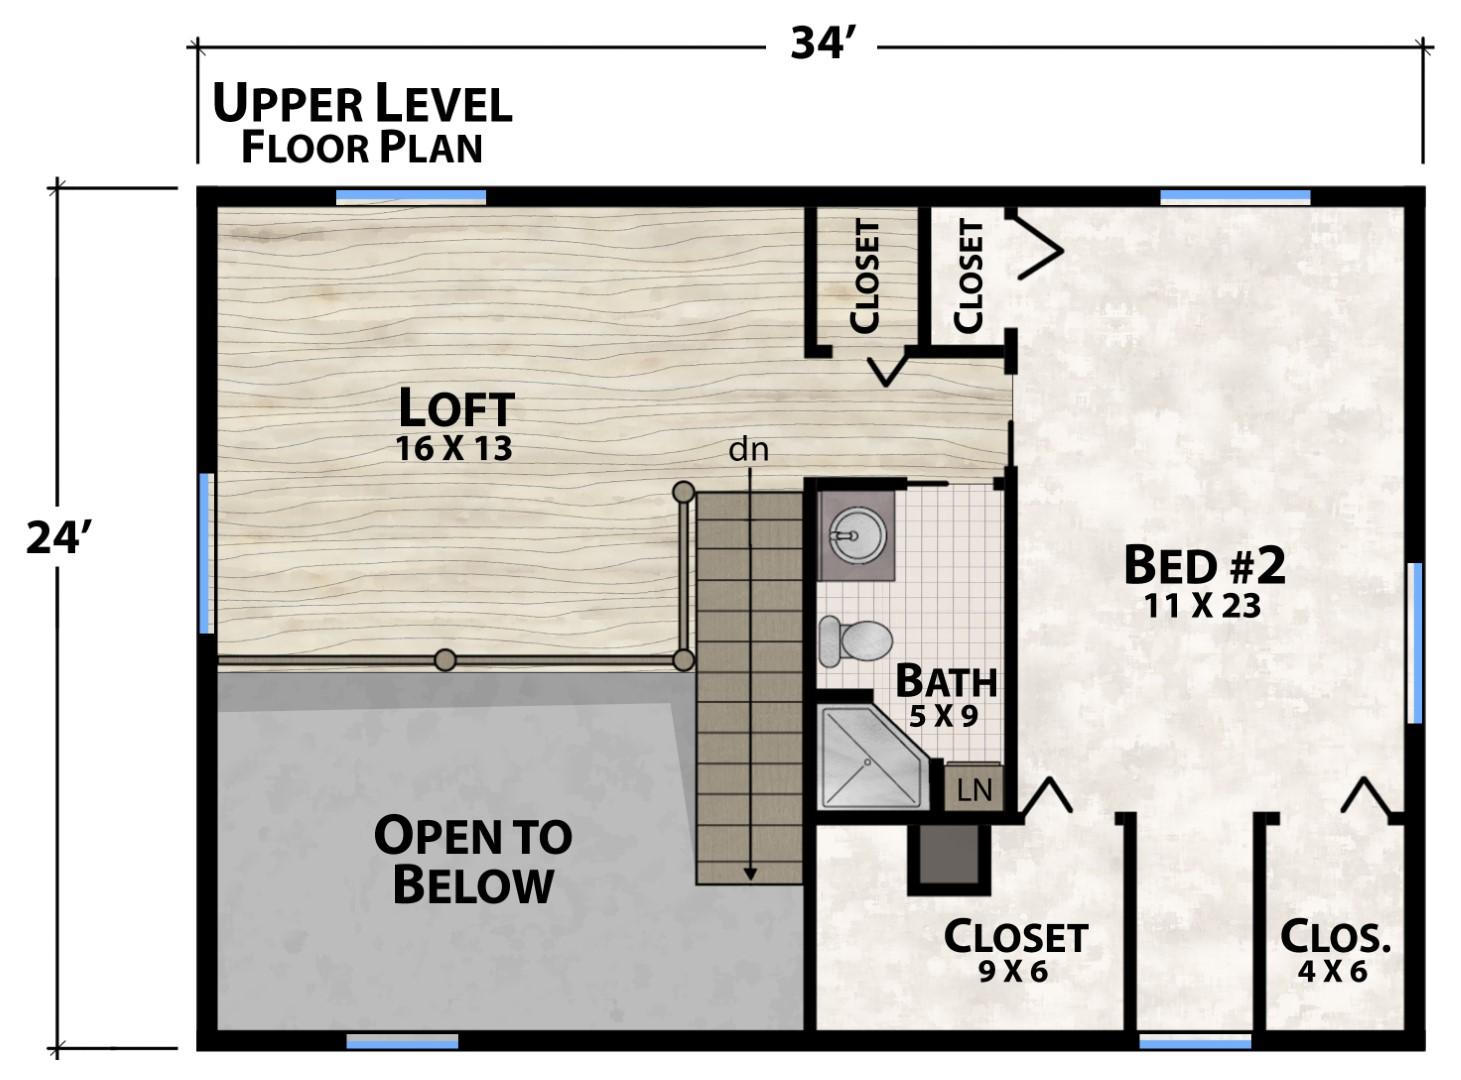 Rock Wren Upper Floor Plan by Natural Element Homes